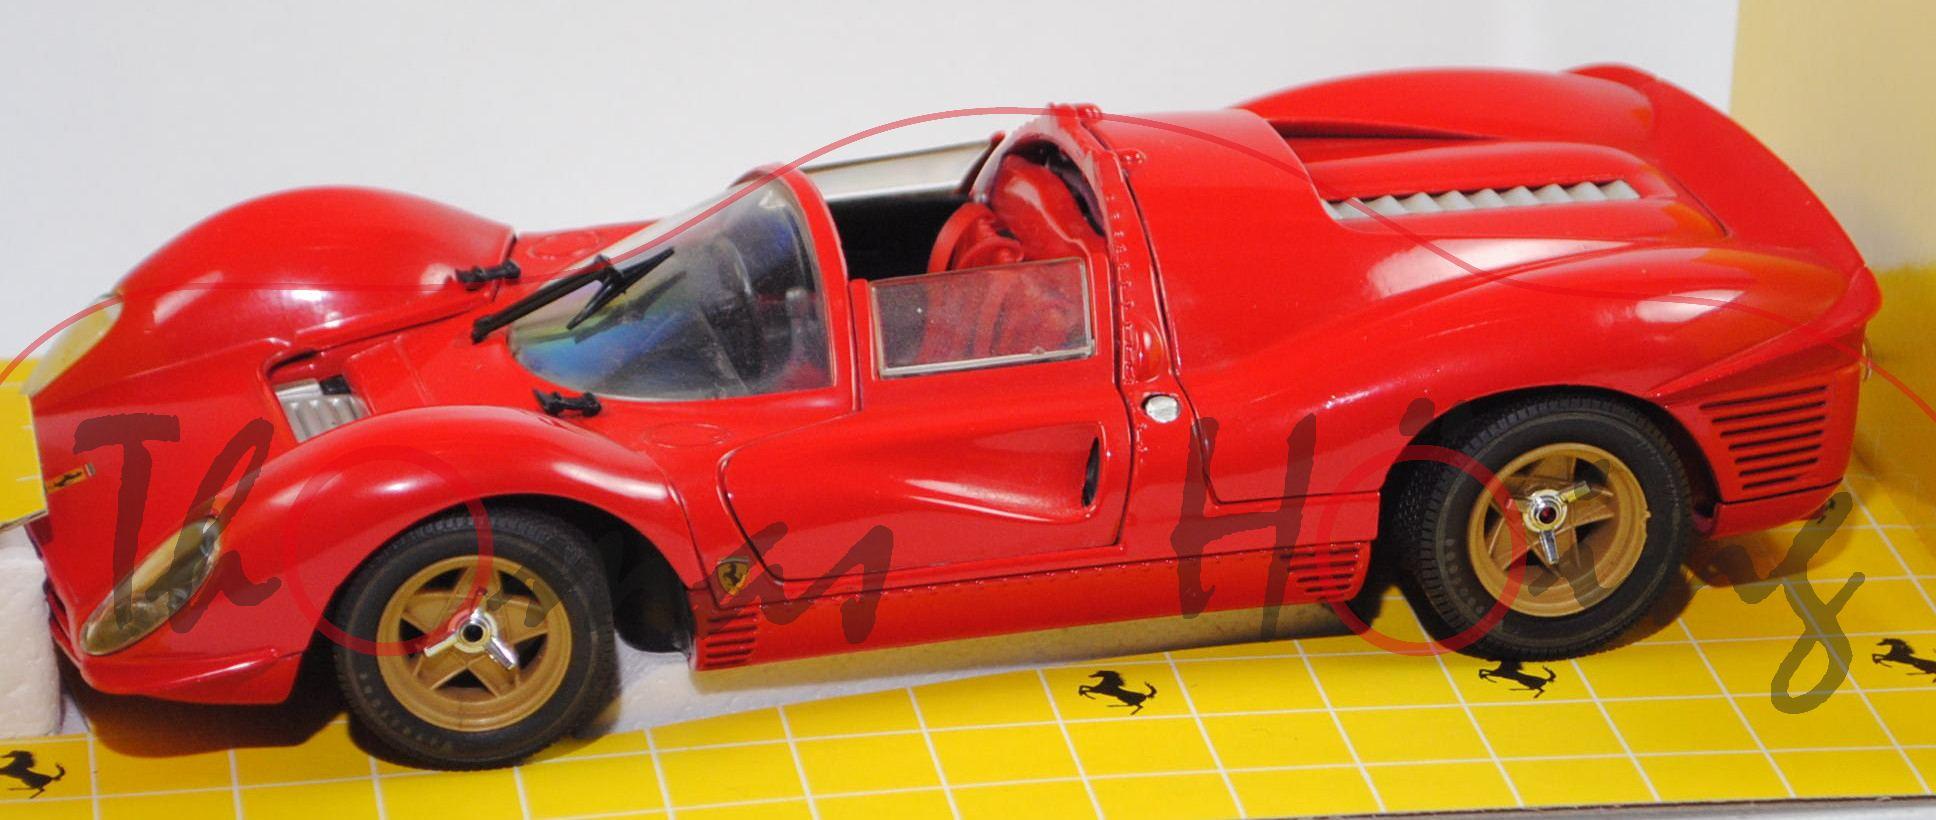 Ferrari 330 P4 Typ Spyder Mod 1967 Rot Revell Jouef Evolution Art Nr Jouef 3005 1 18 Mb Produktarchiv Online Shop Automodelle Höing